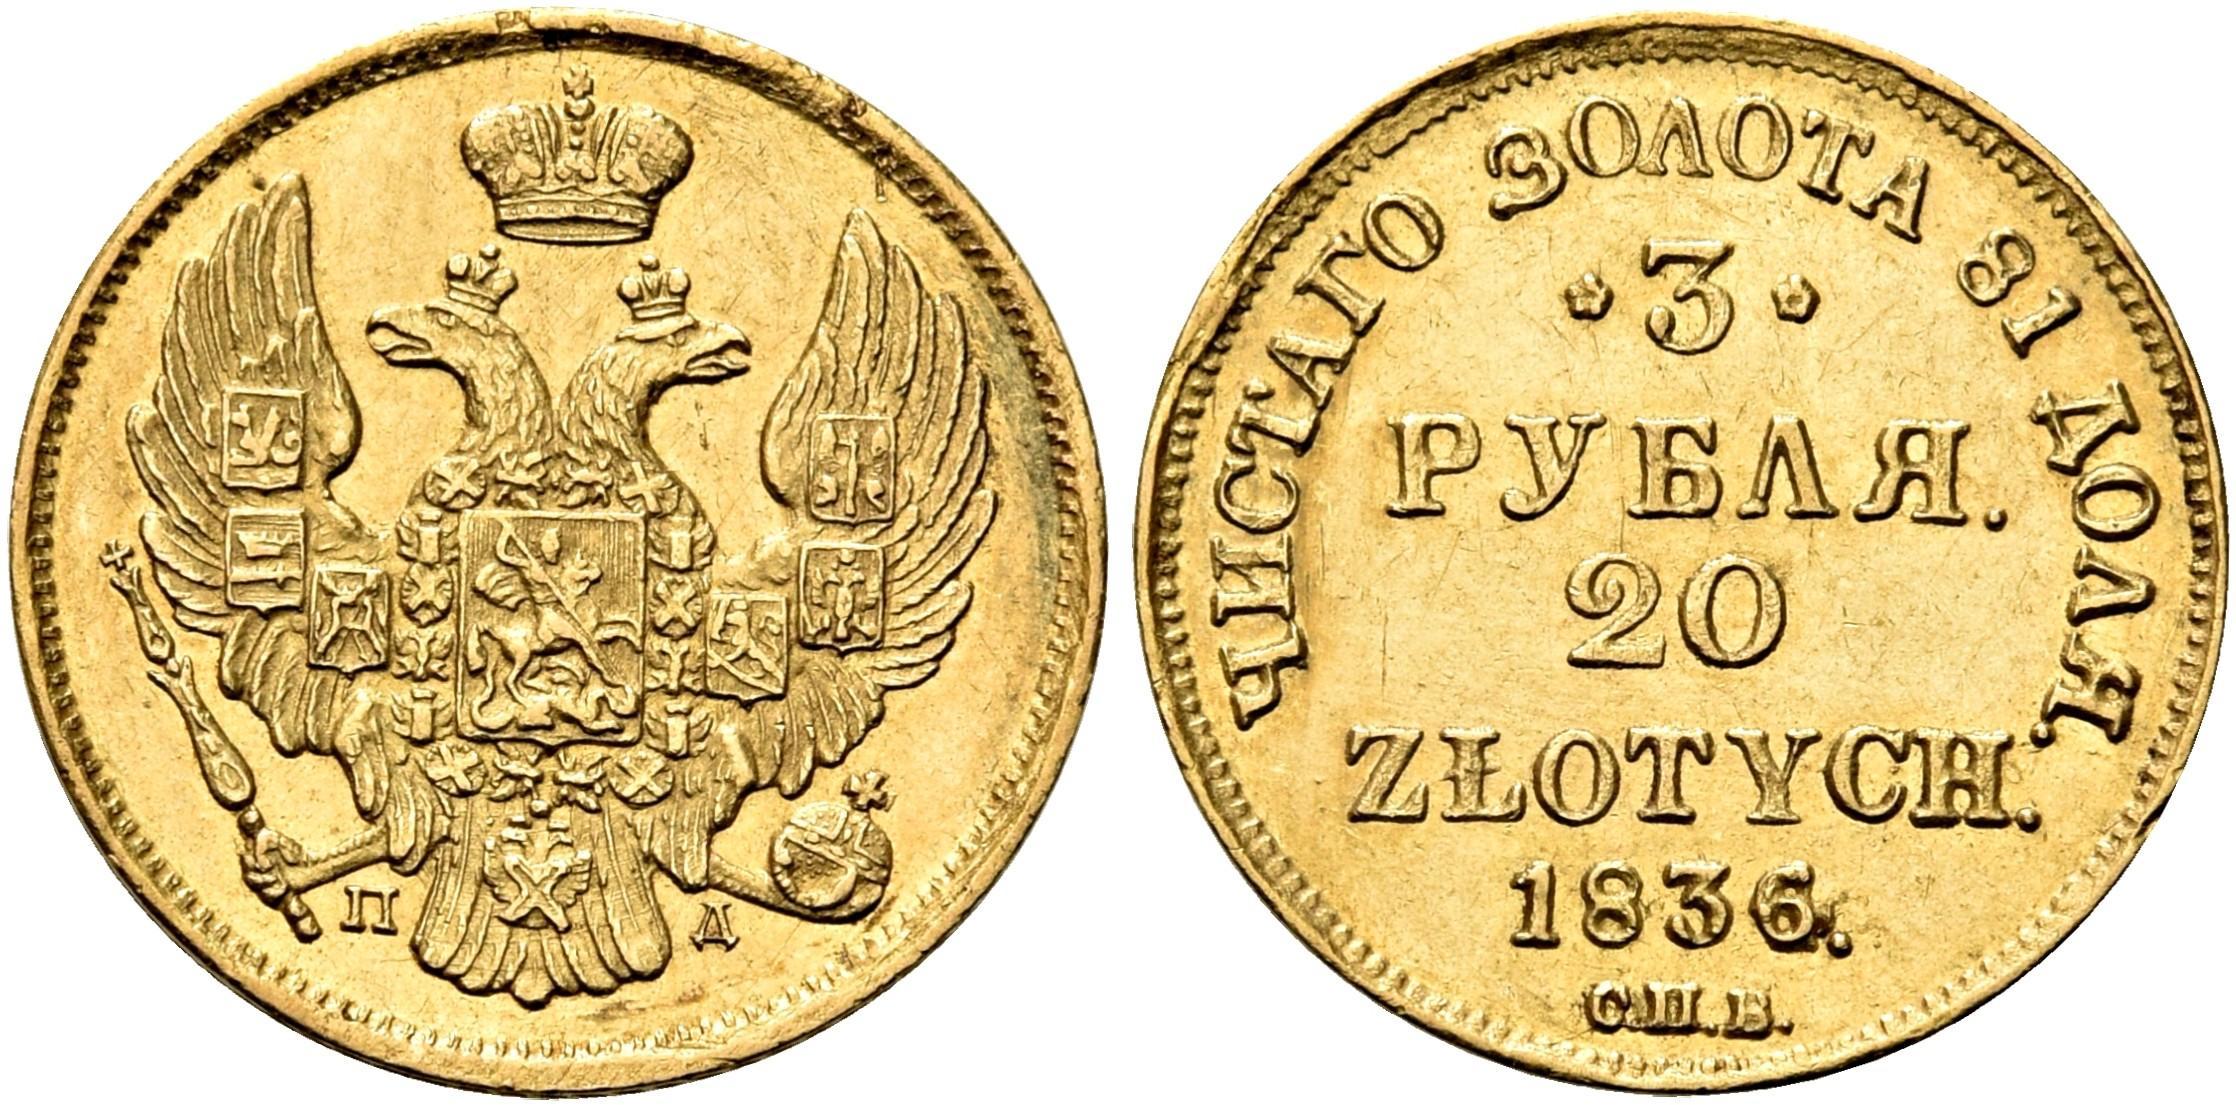 PL 20 Zloty/ 3 Rubles 1836 C.П.Б.